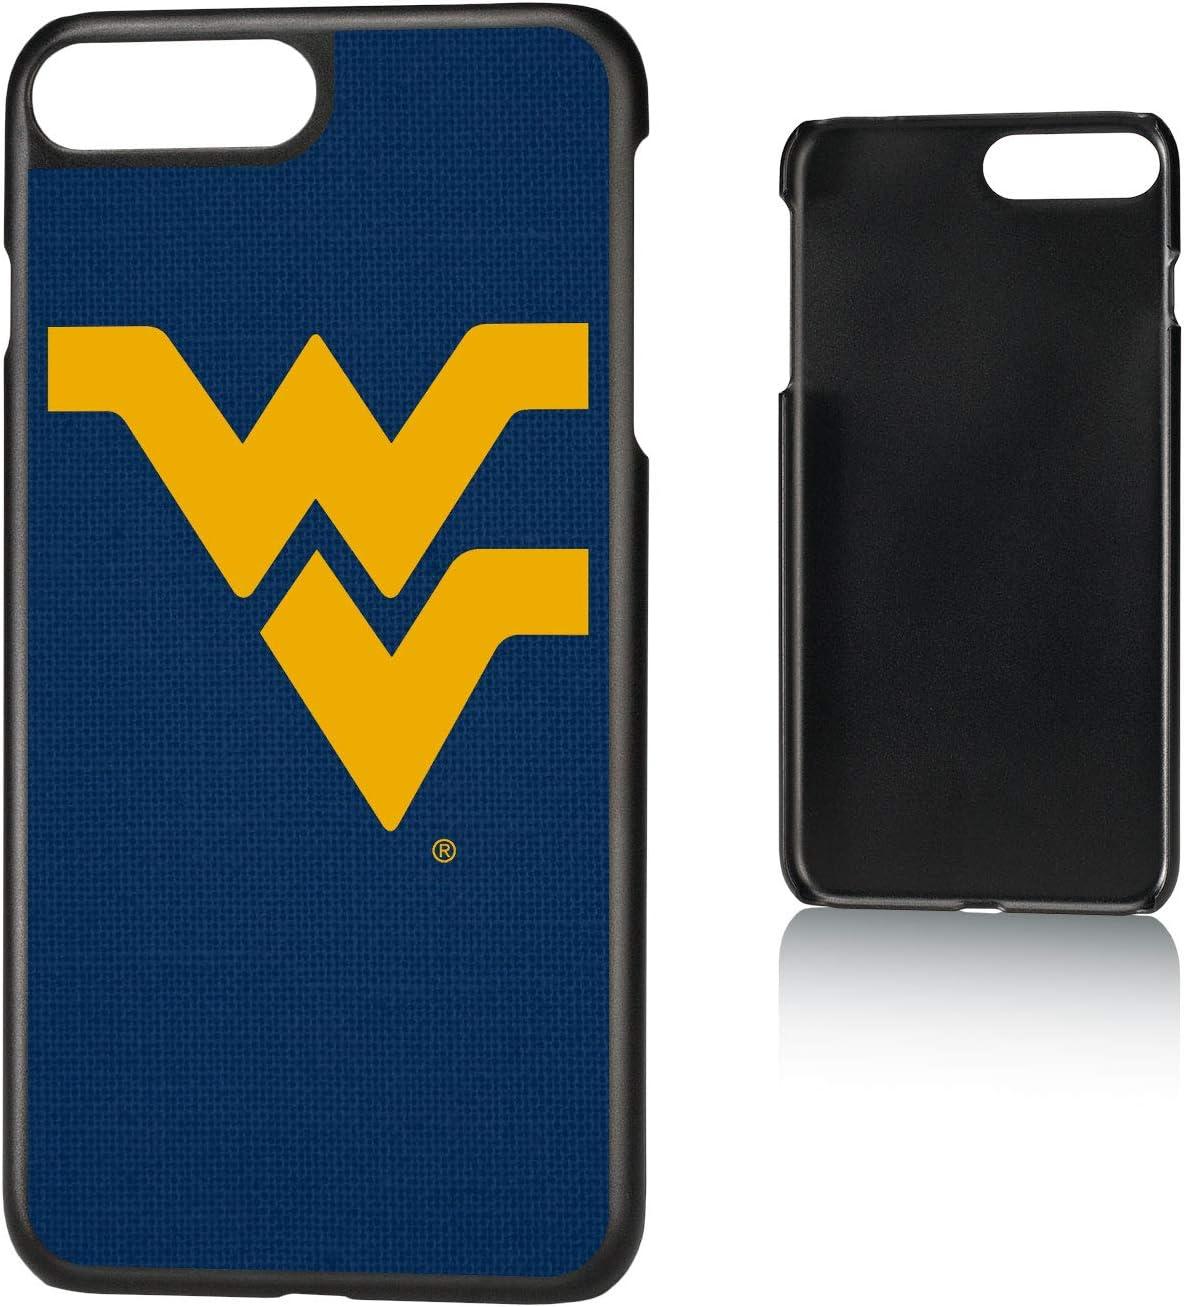 iPhone 6 Plus Keyscaper NCAA West Virginia Mountaineers Apple iPhone Bump Case Black